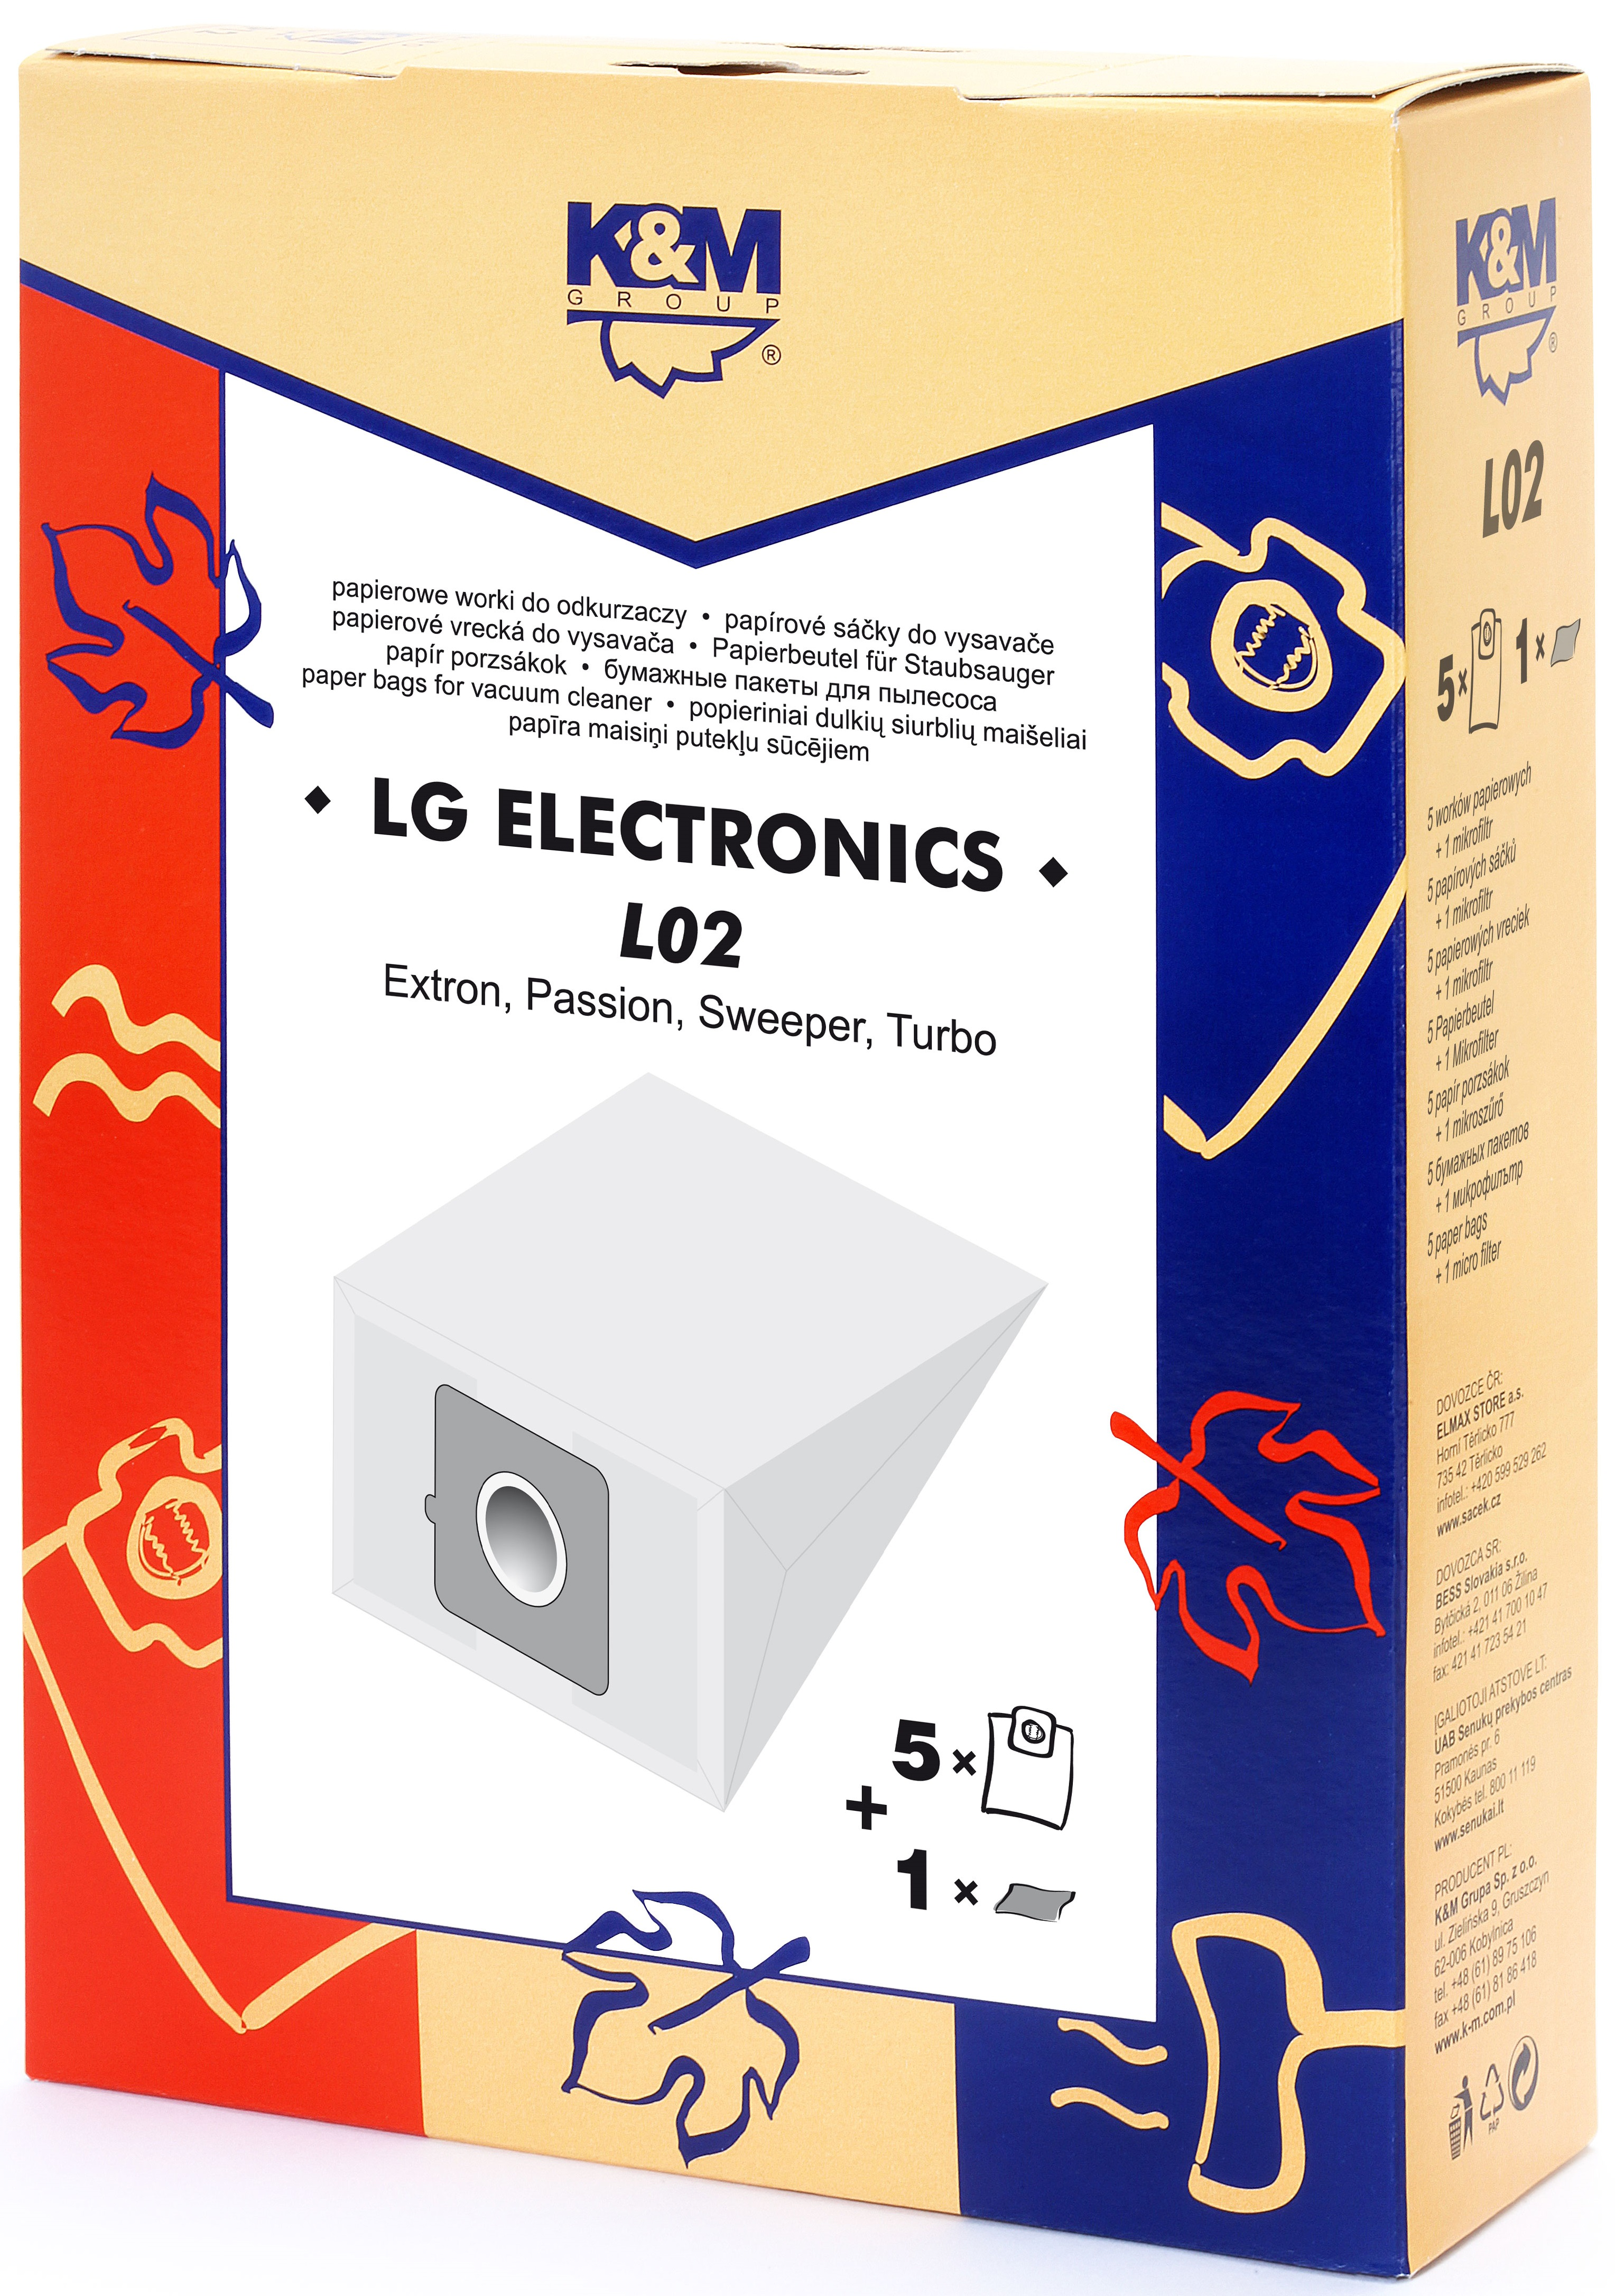 Sac aspirator LG TB-33, hartie, 5X saci + 1 filtru, K&M 0